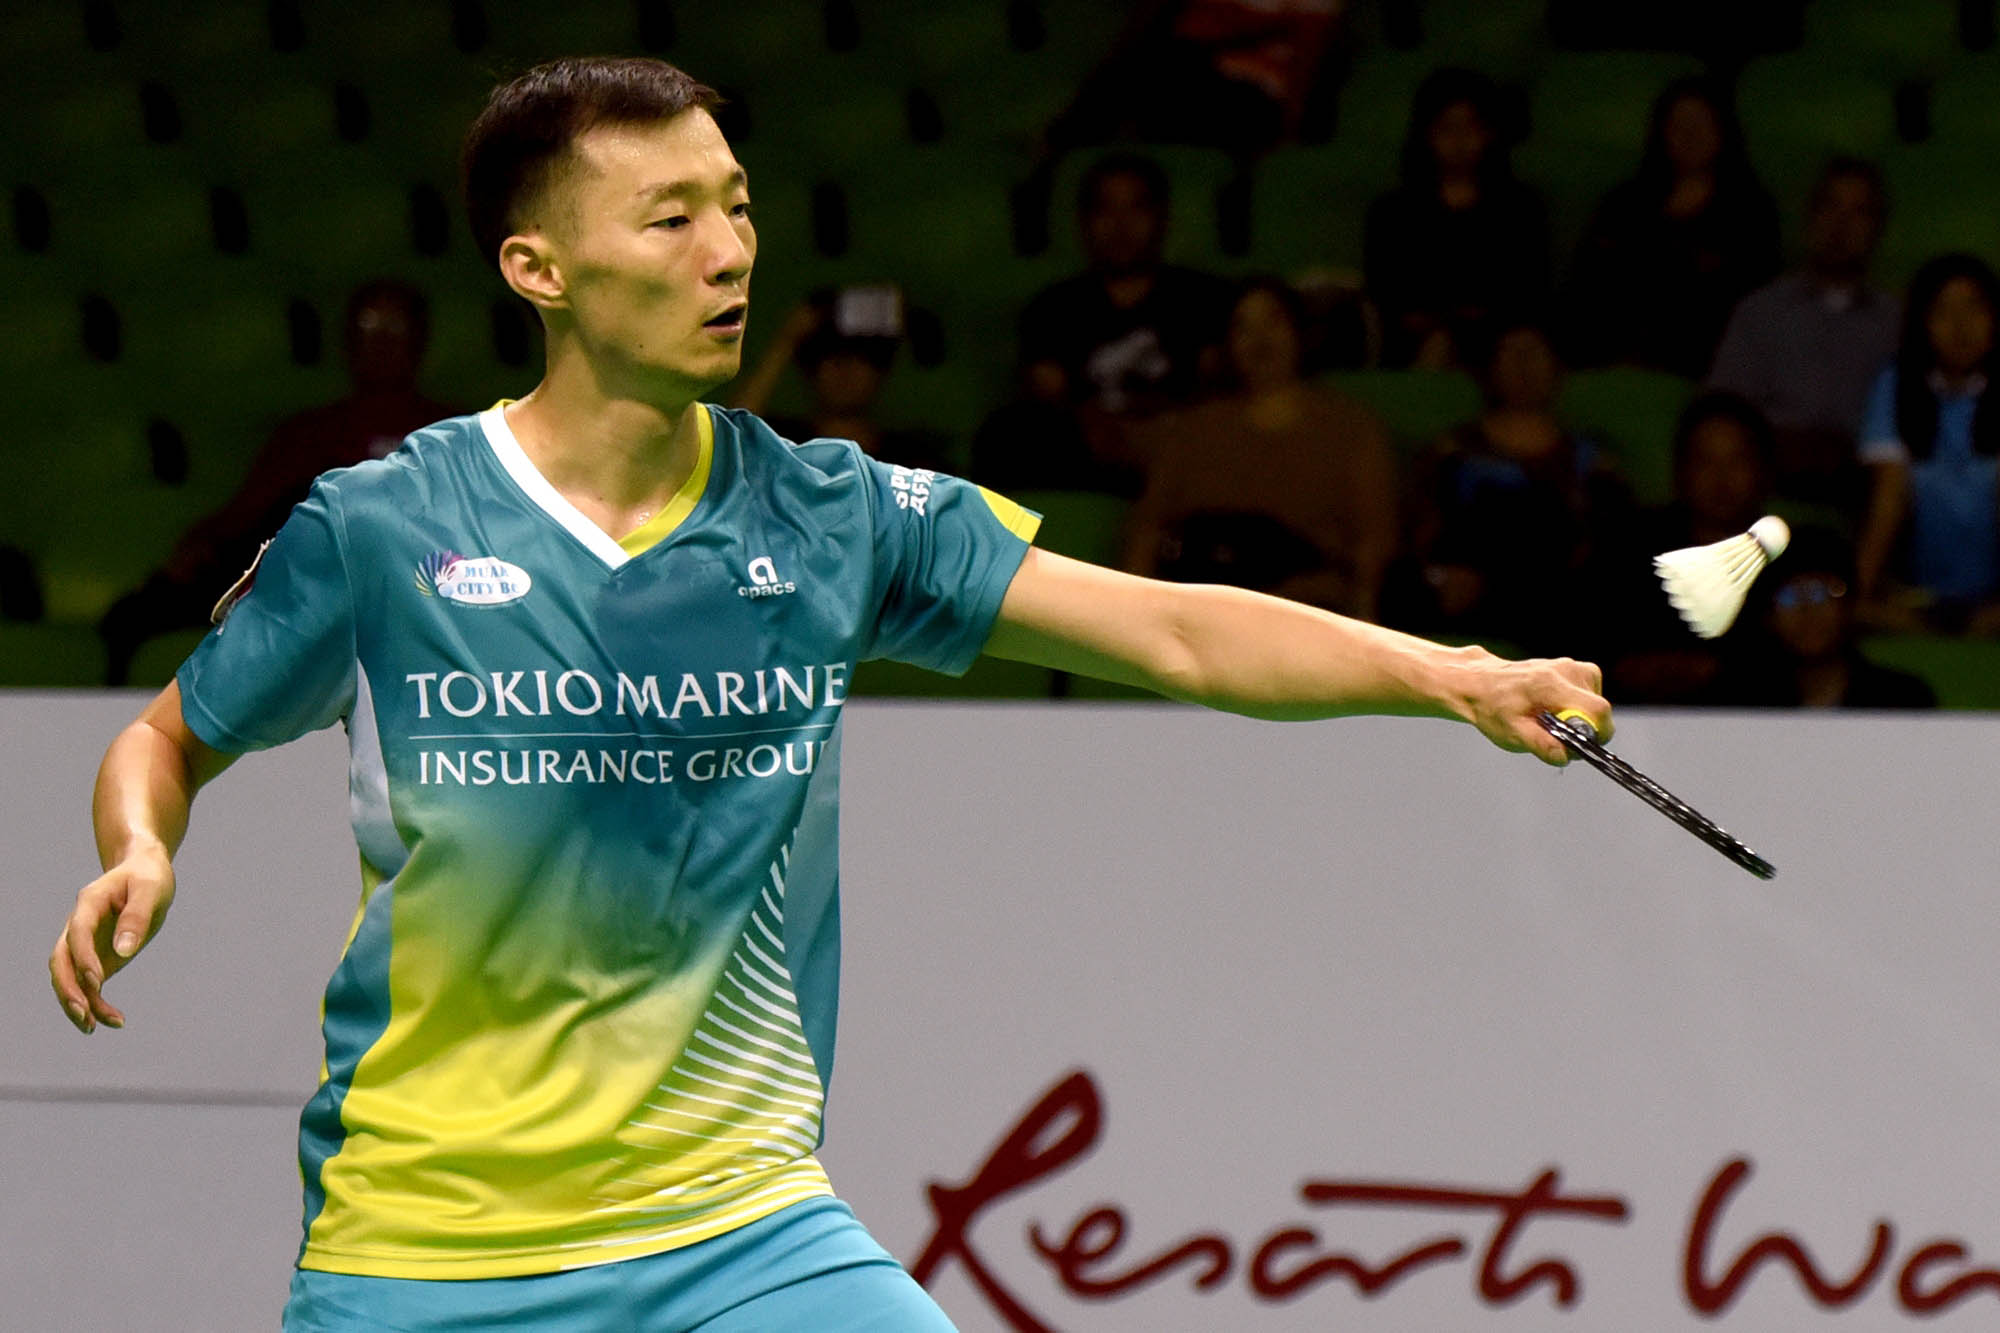 Champions Challenge - Muar City Badminton Club - Mens Single - Lee Hyun Il. Photo Credit - www.1titan.com